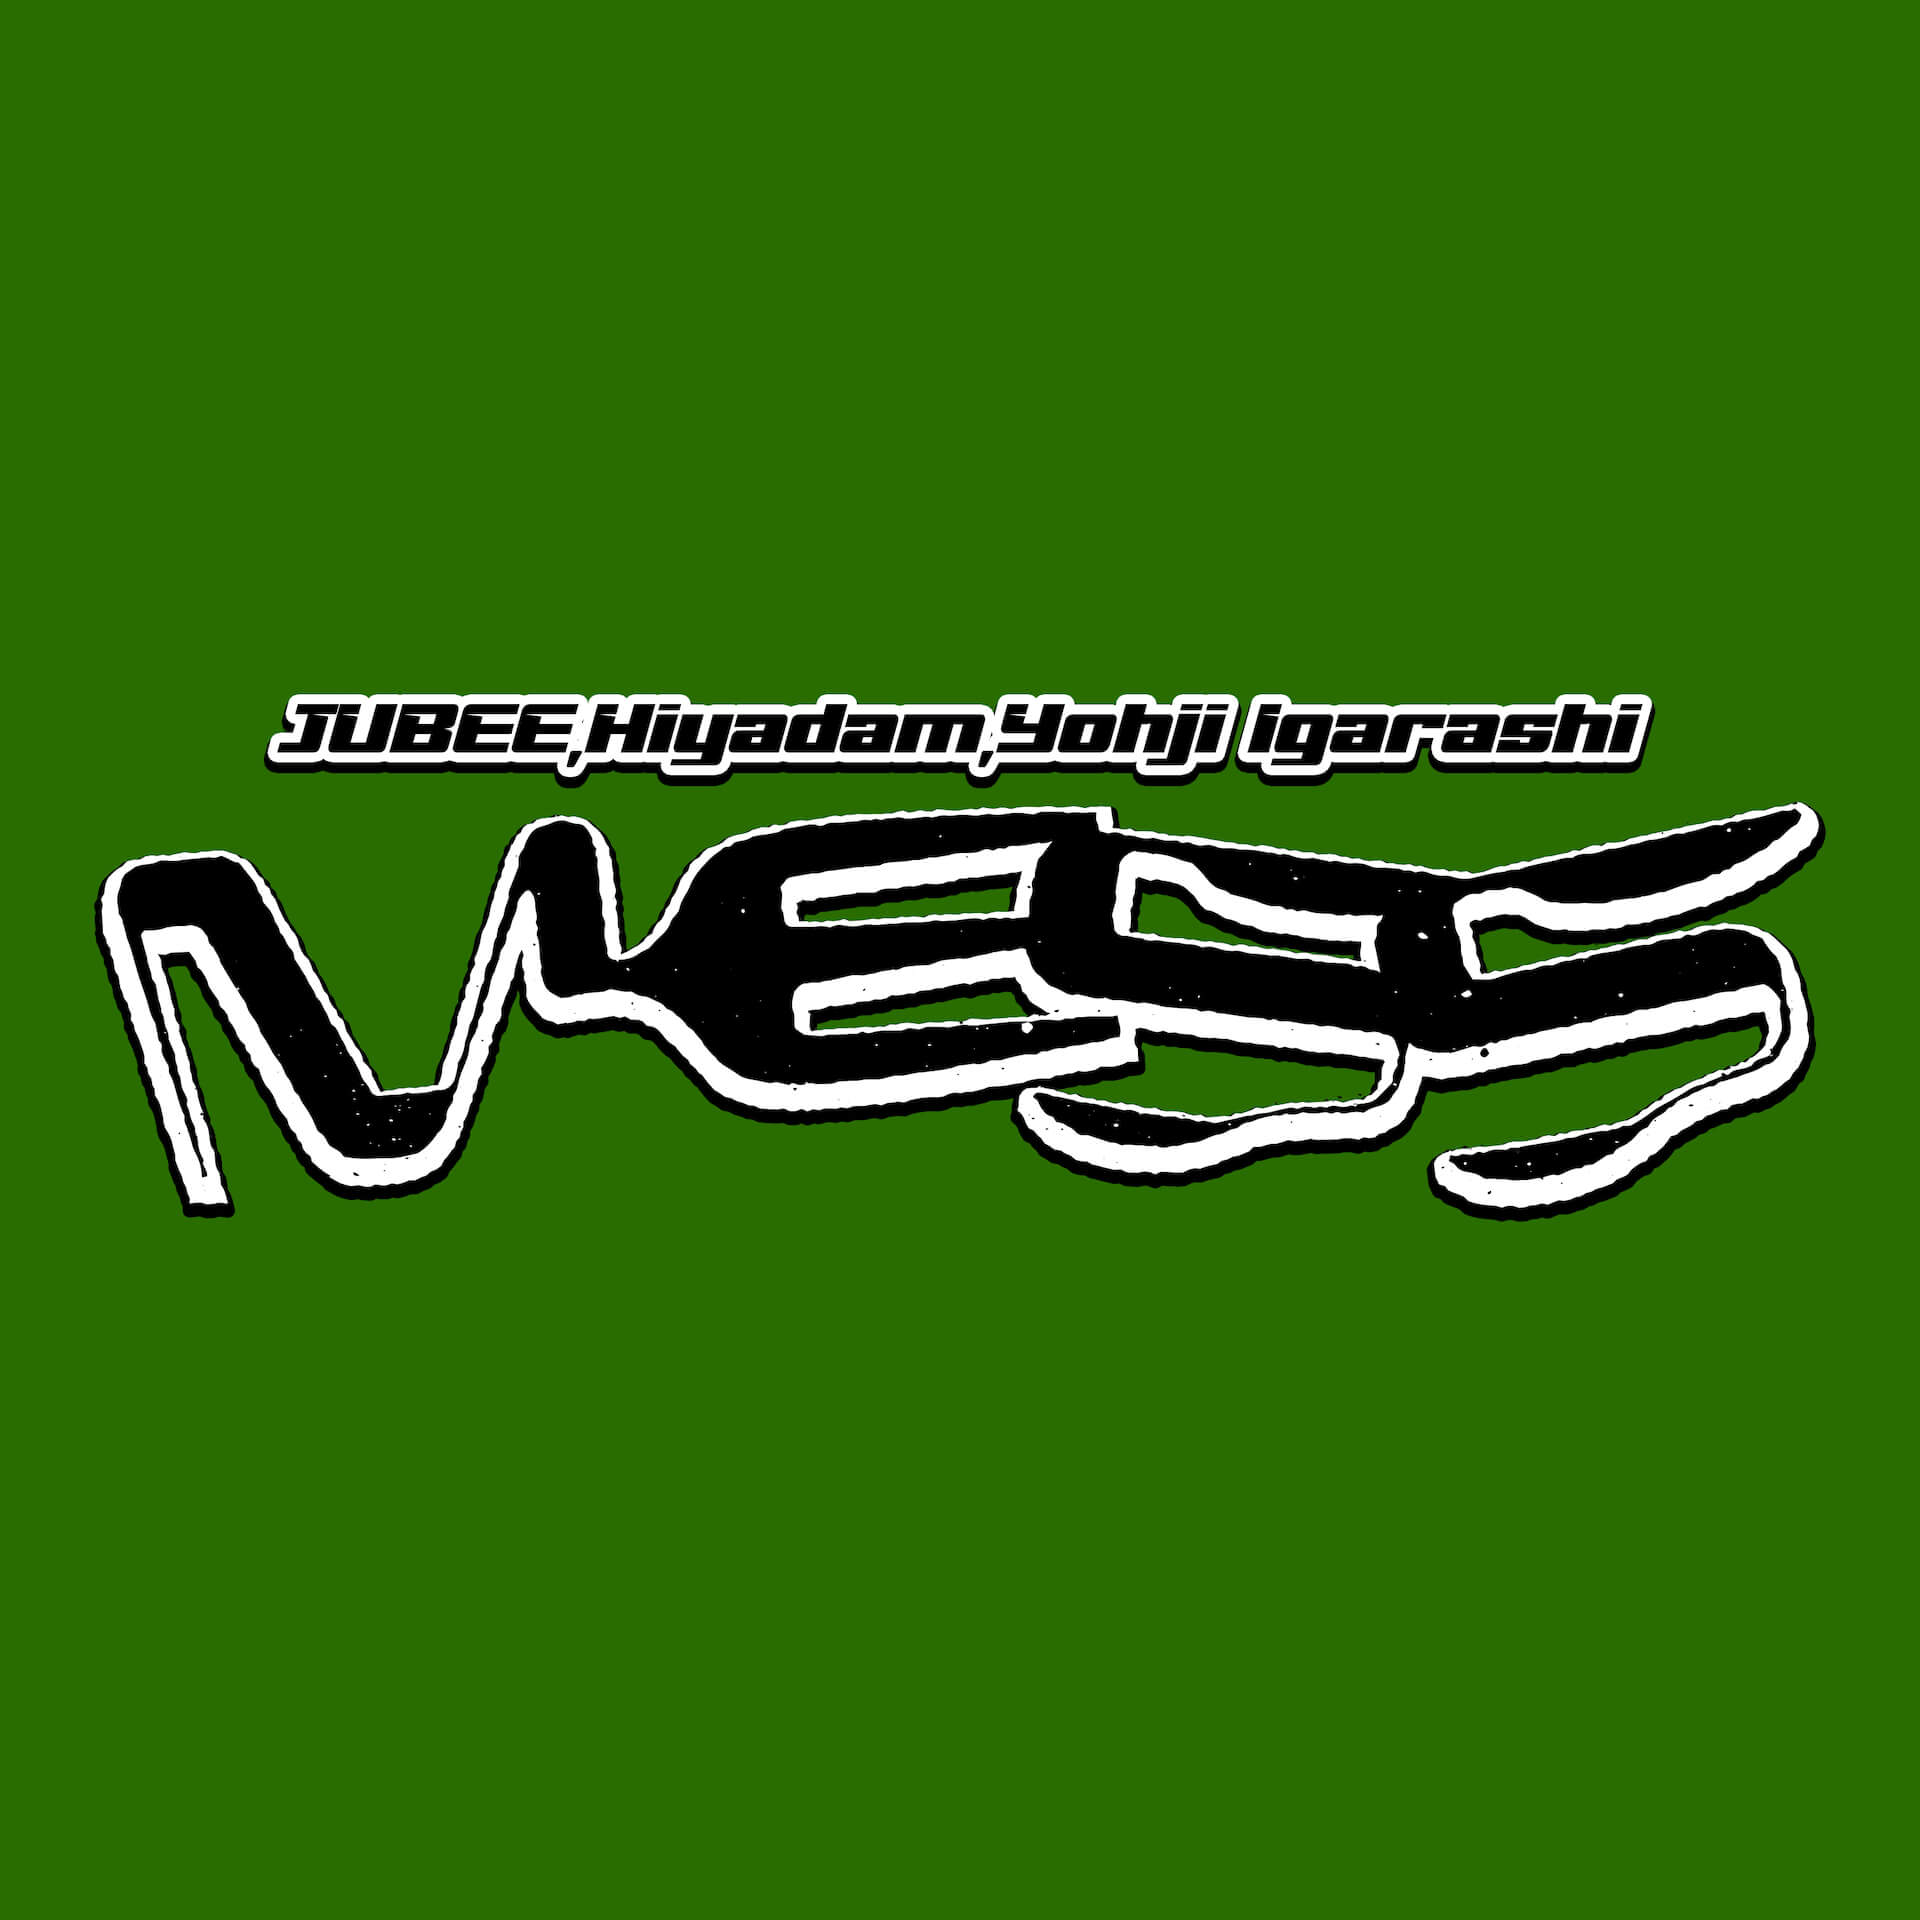 "JUBEEが客演にHIYADAMを迎えた新曲""Mess""のMVを公開!Yohji Igarashiがプロデュース music210914_jubee_hiyadam_3"